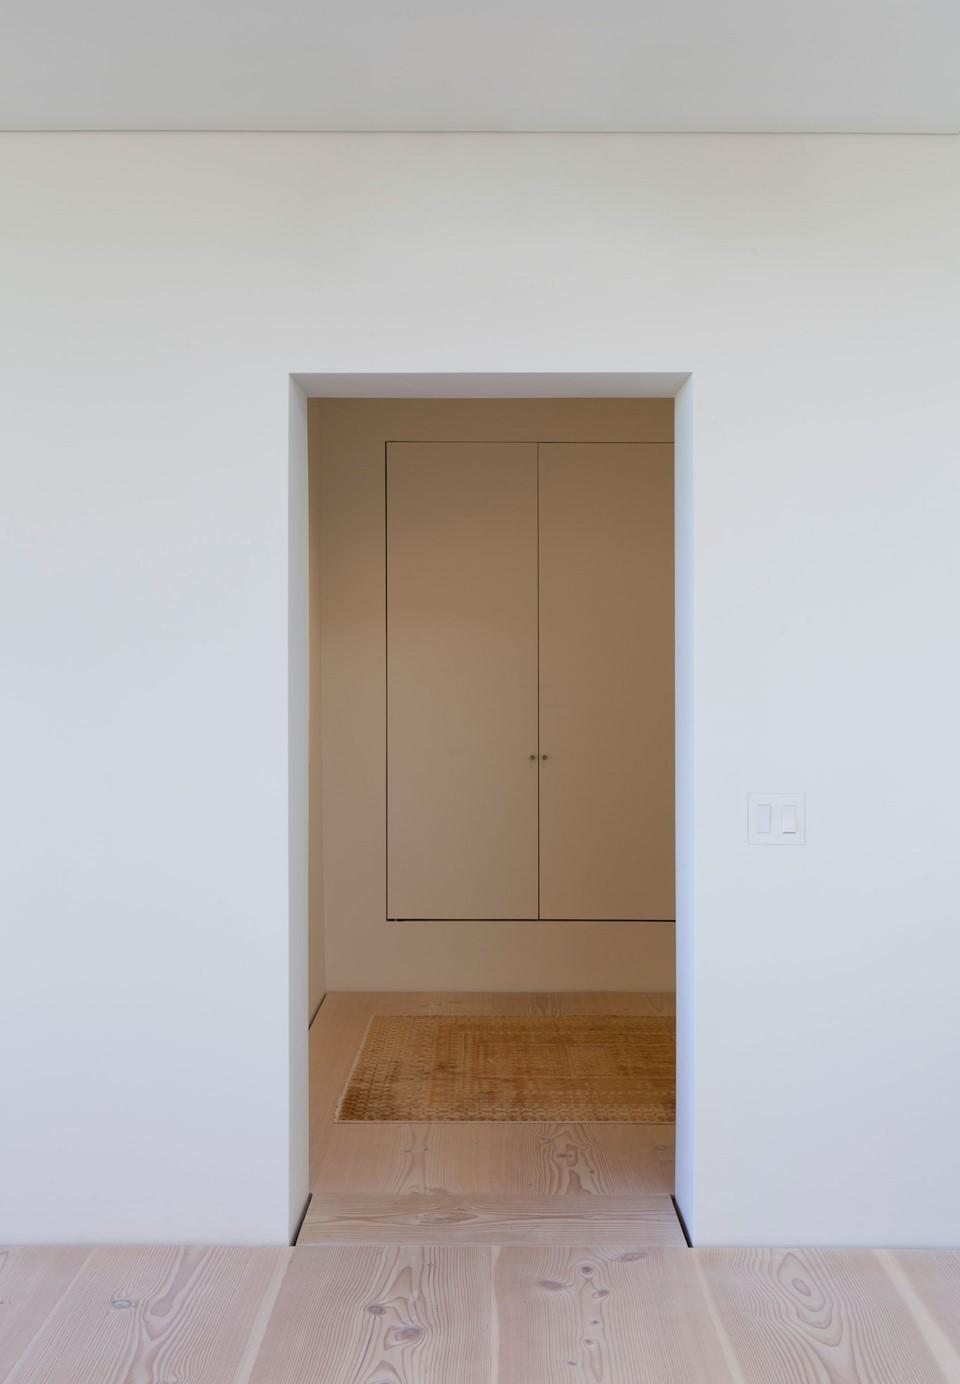 douglas-flooring_lye-and-white-soap_central-park-office_hallway_dinesen.jpg